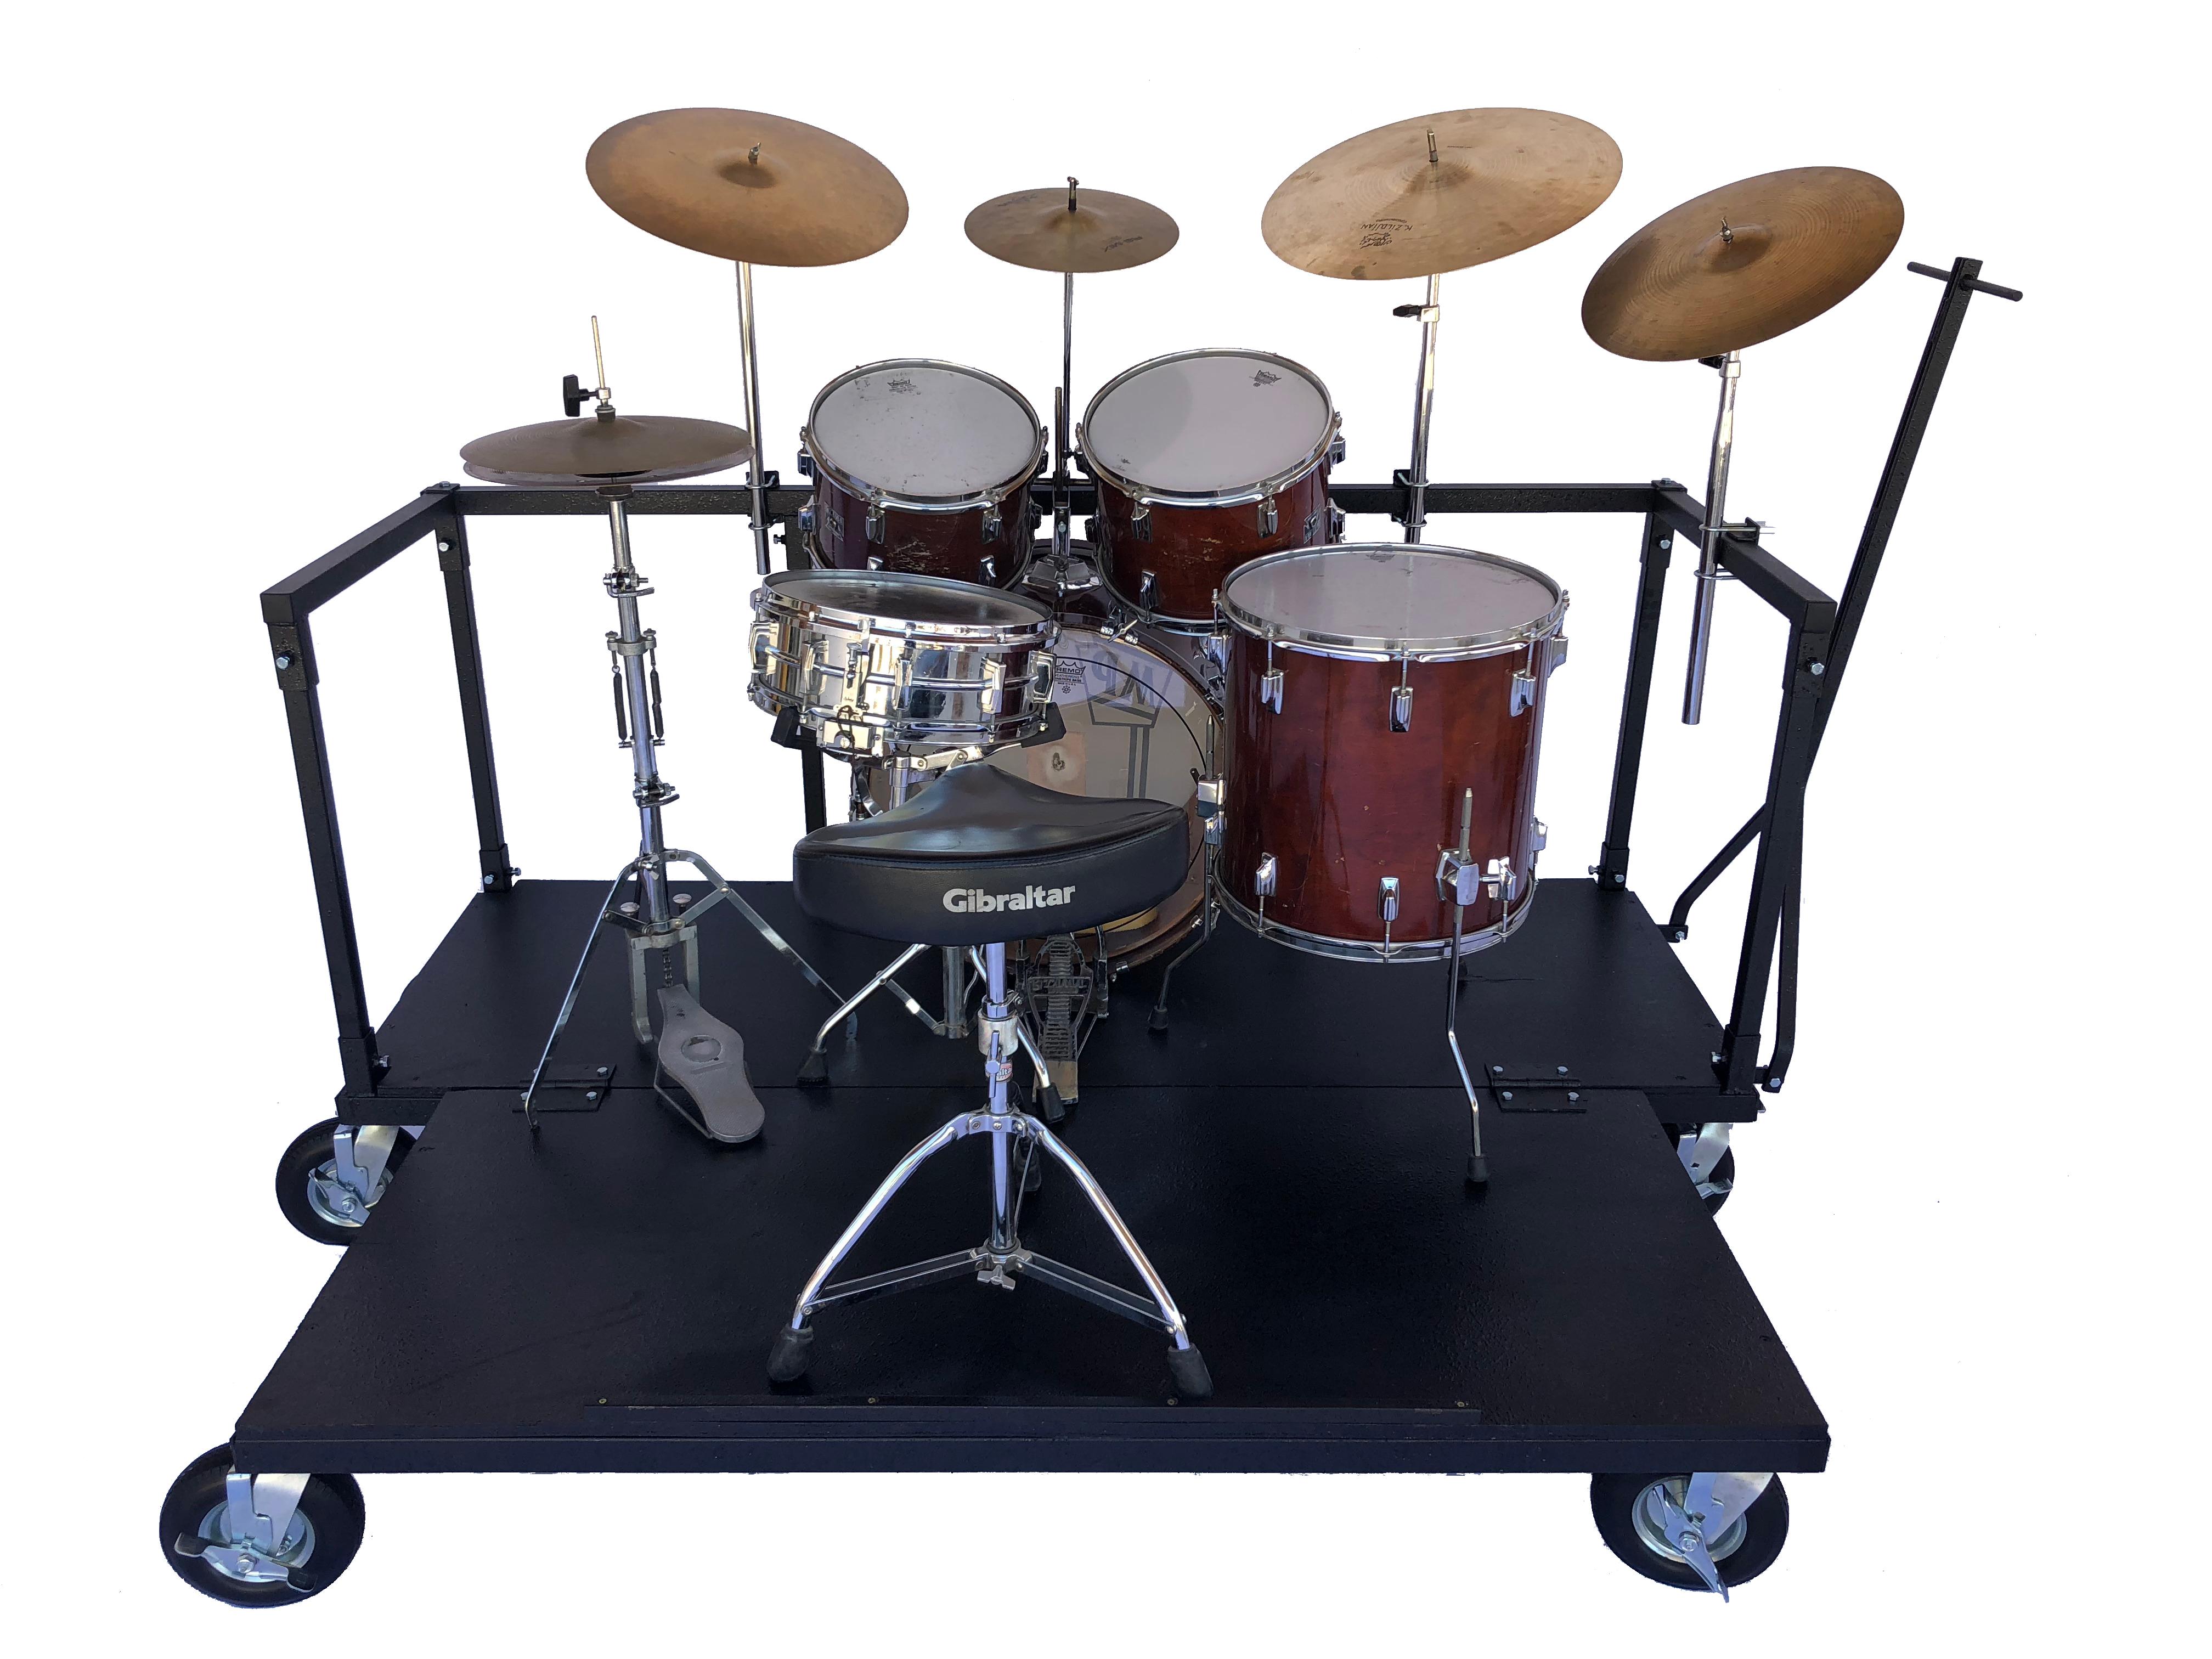 Drum Set Cart - $2495